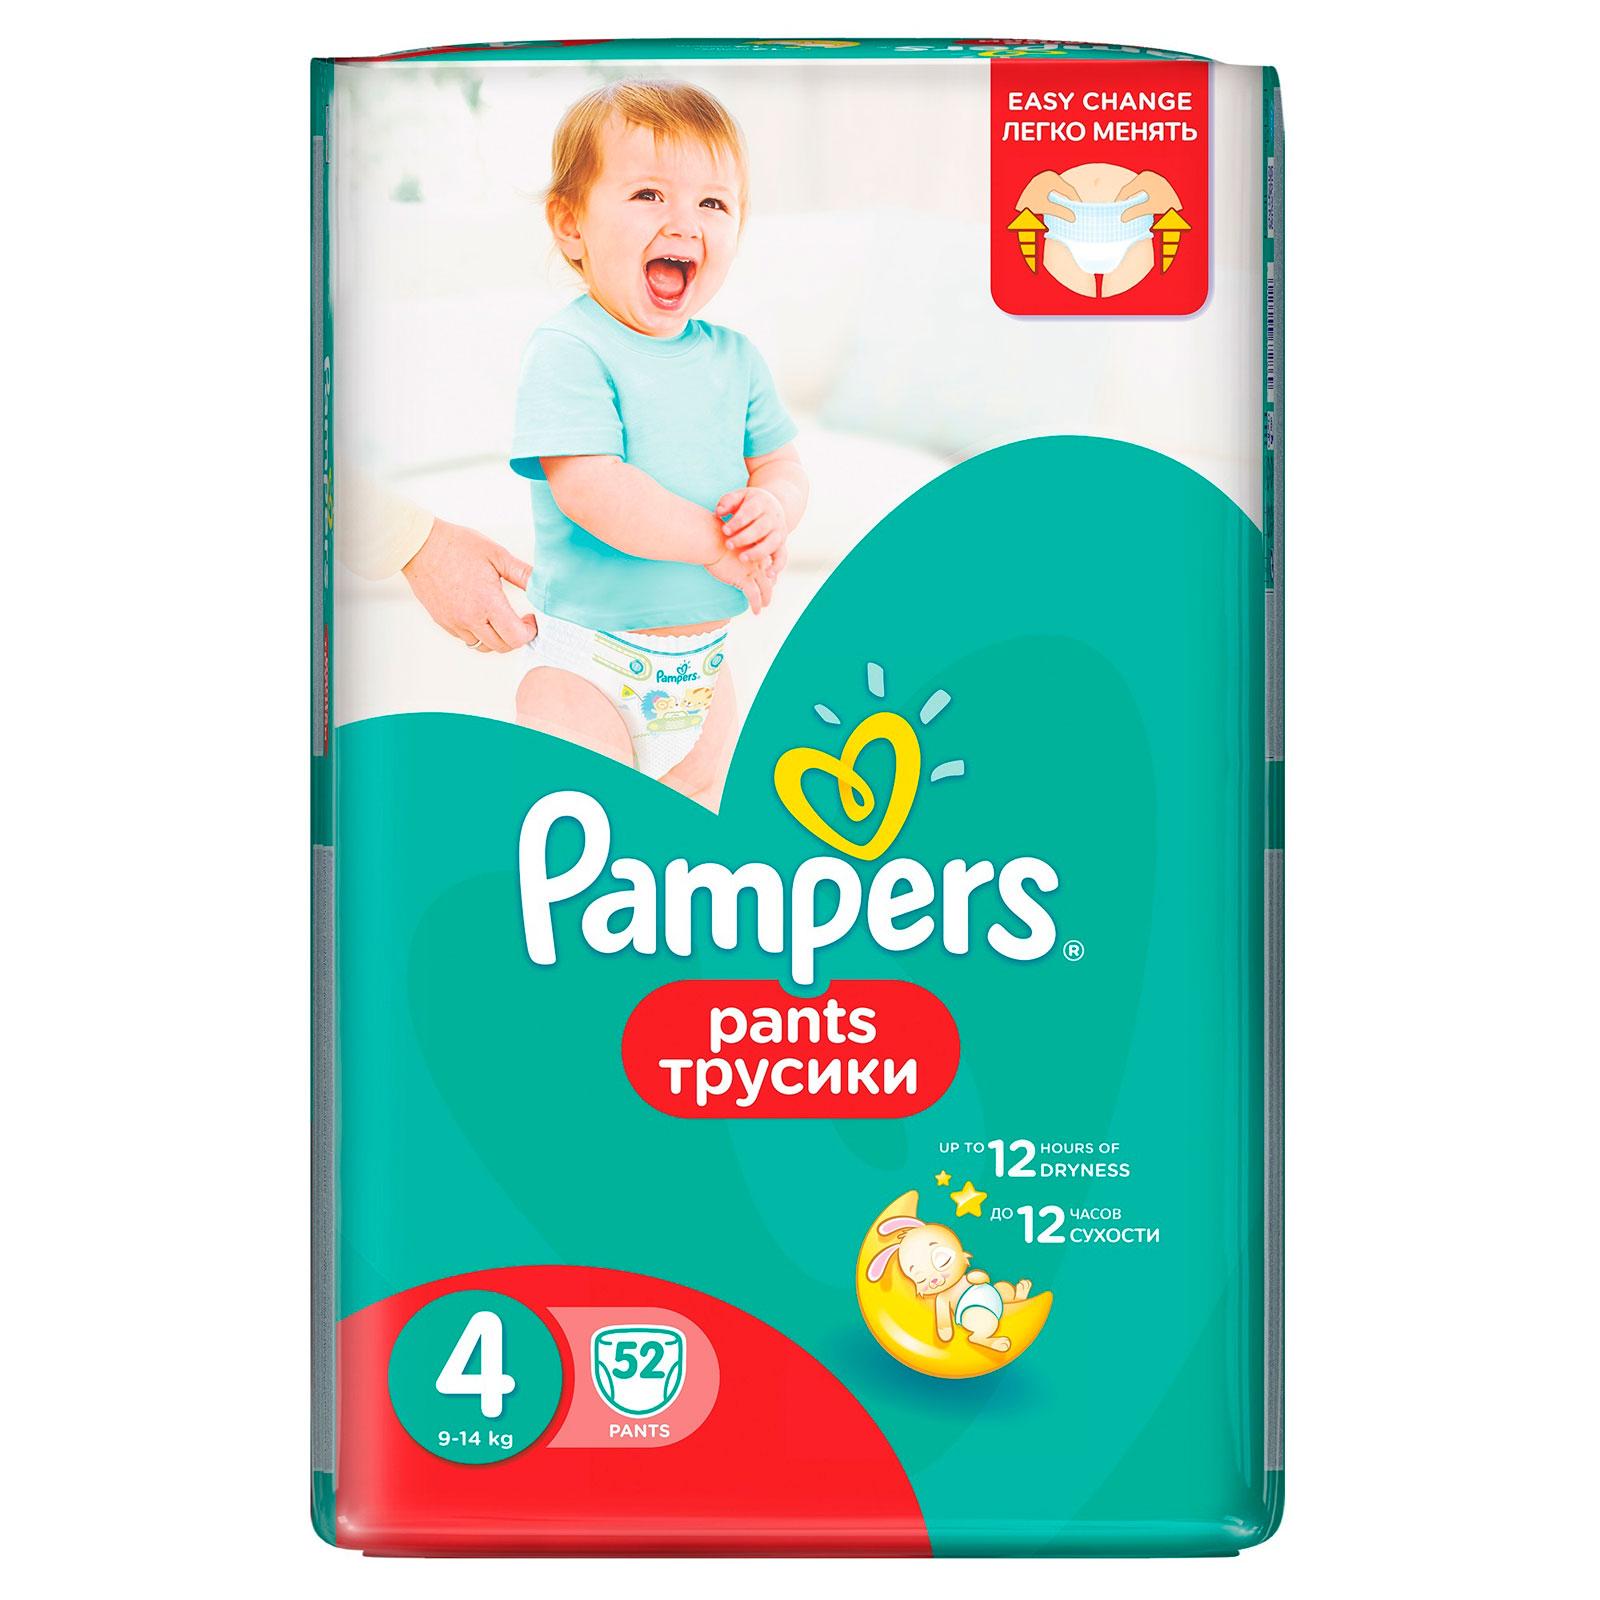 Трусики Pampers Pants Maxi 9-14 кг (52 шт) Размер 4<br>